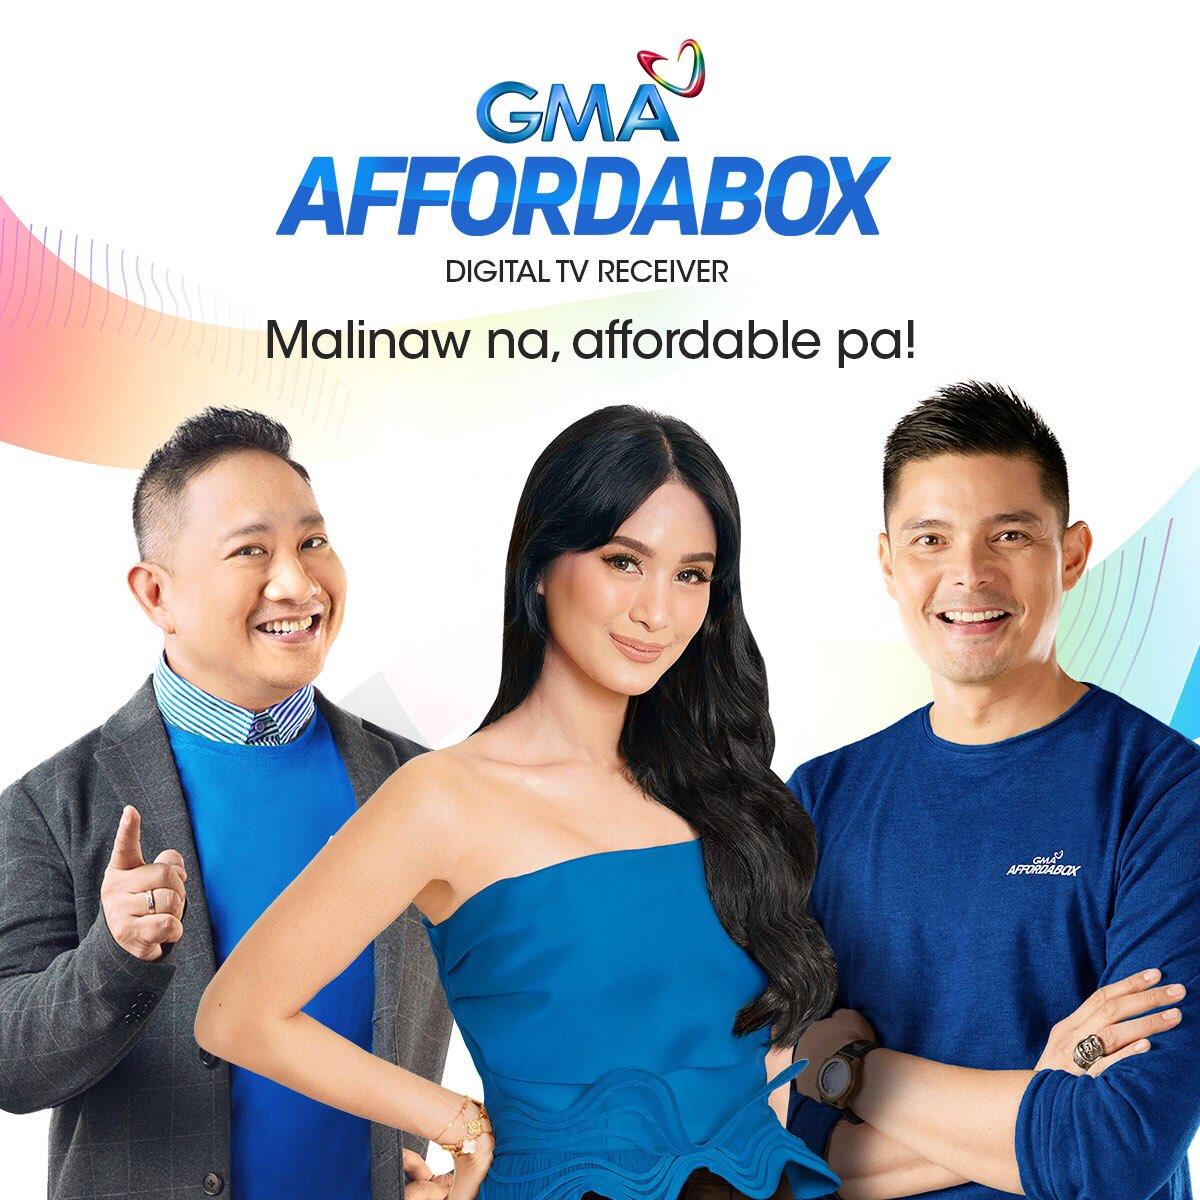 top-8-reasons-to-buy-gma-affordabox